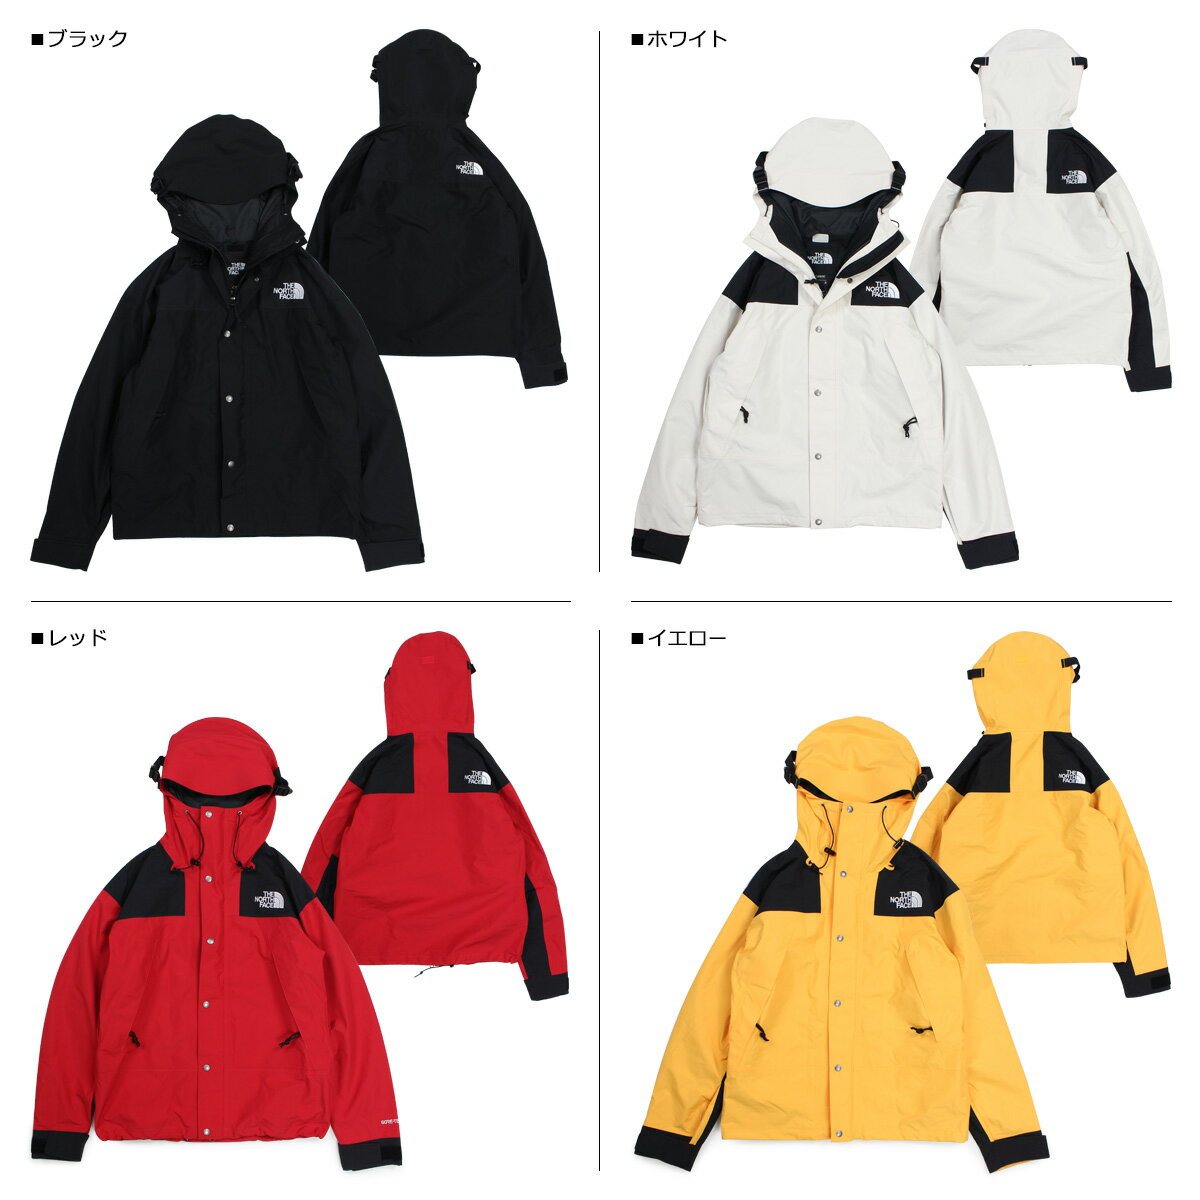 7ddf0e510 THE NORTH FACE North Face jacket mountain jacket men Gore-Tex MENS 1990  MOUNTAIN JACKET GTX NF0A3JPA